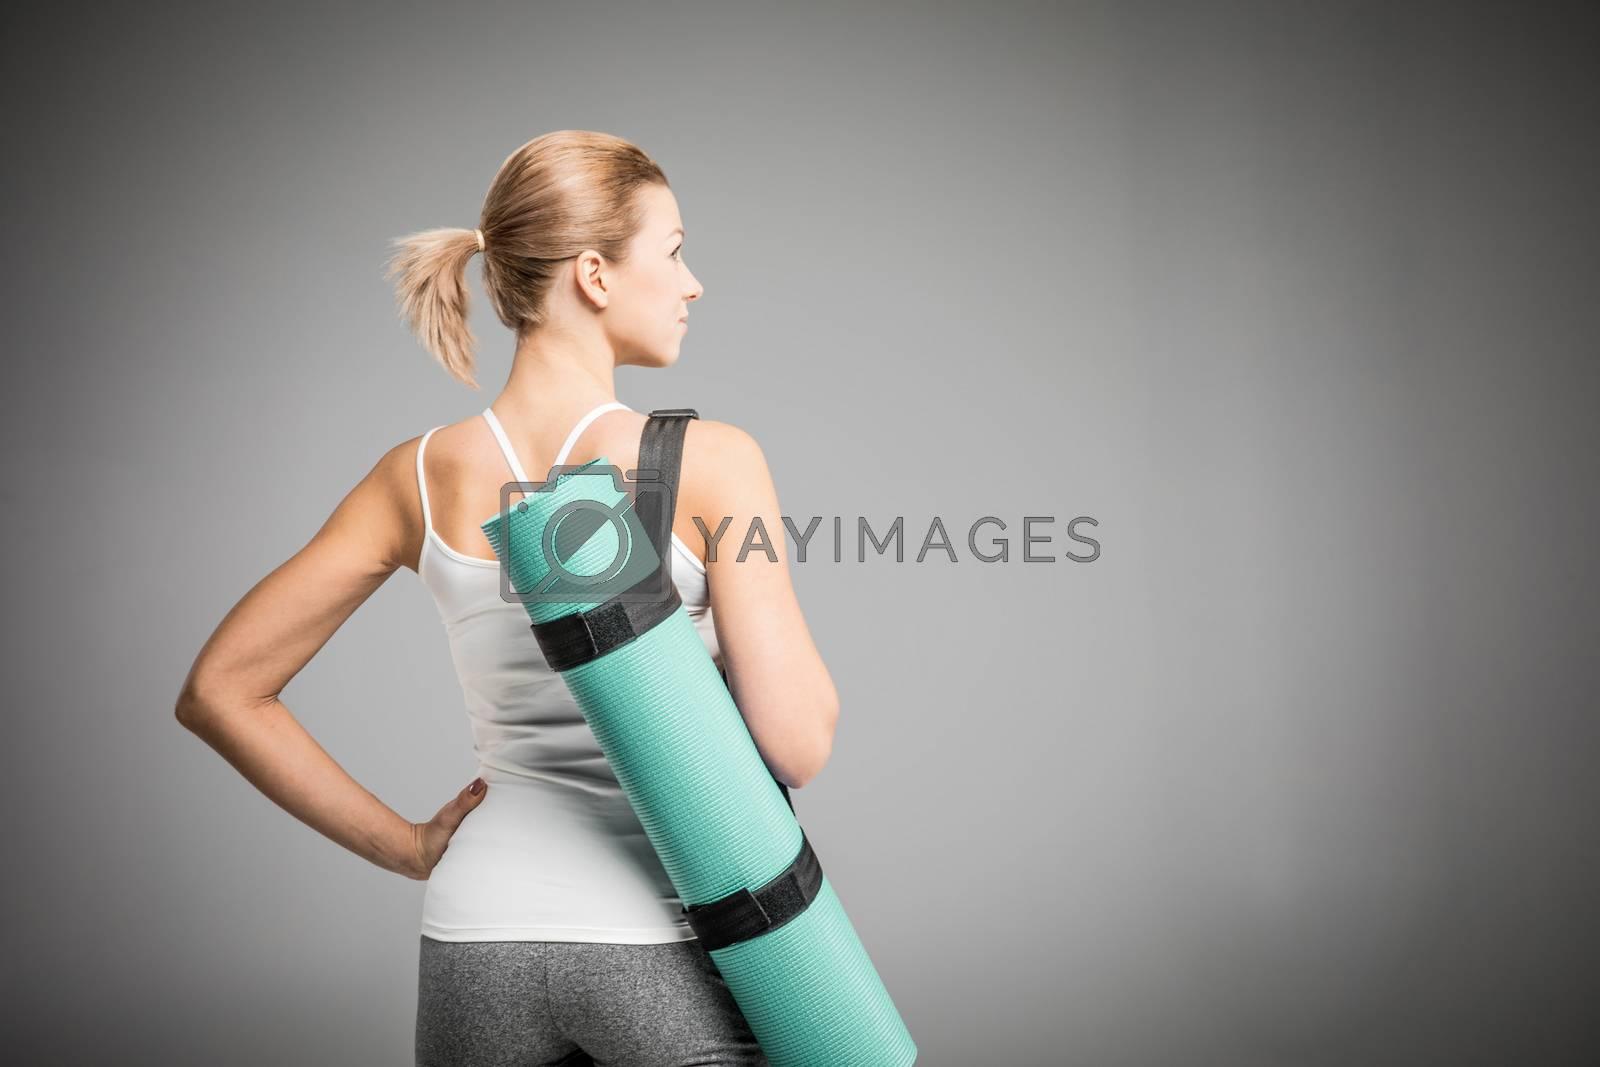 Sportswoman holding yoga mat   by LightFieldStudios